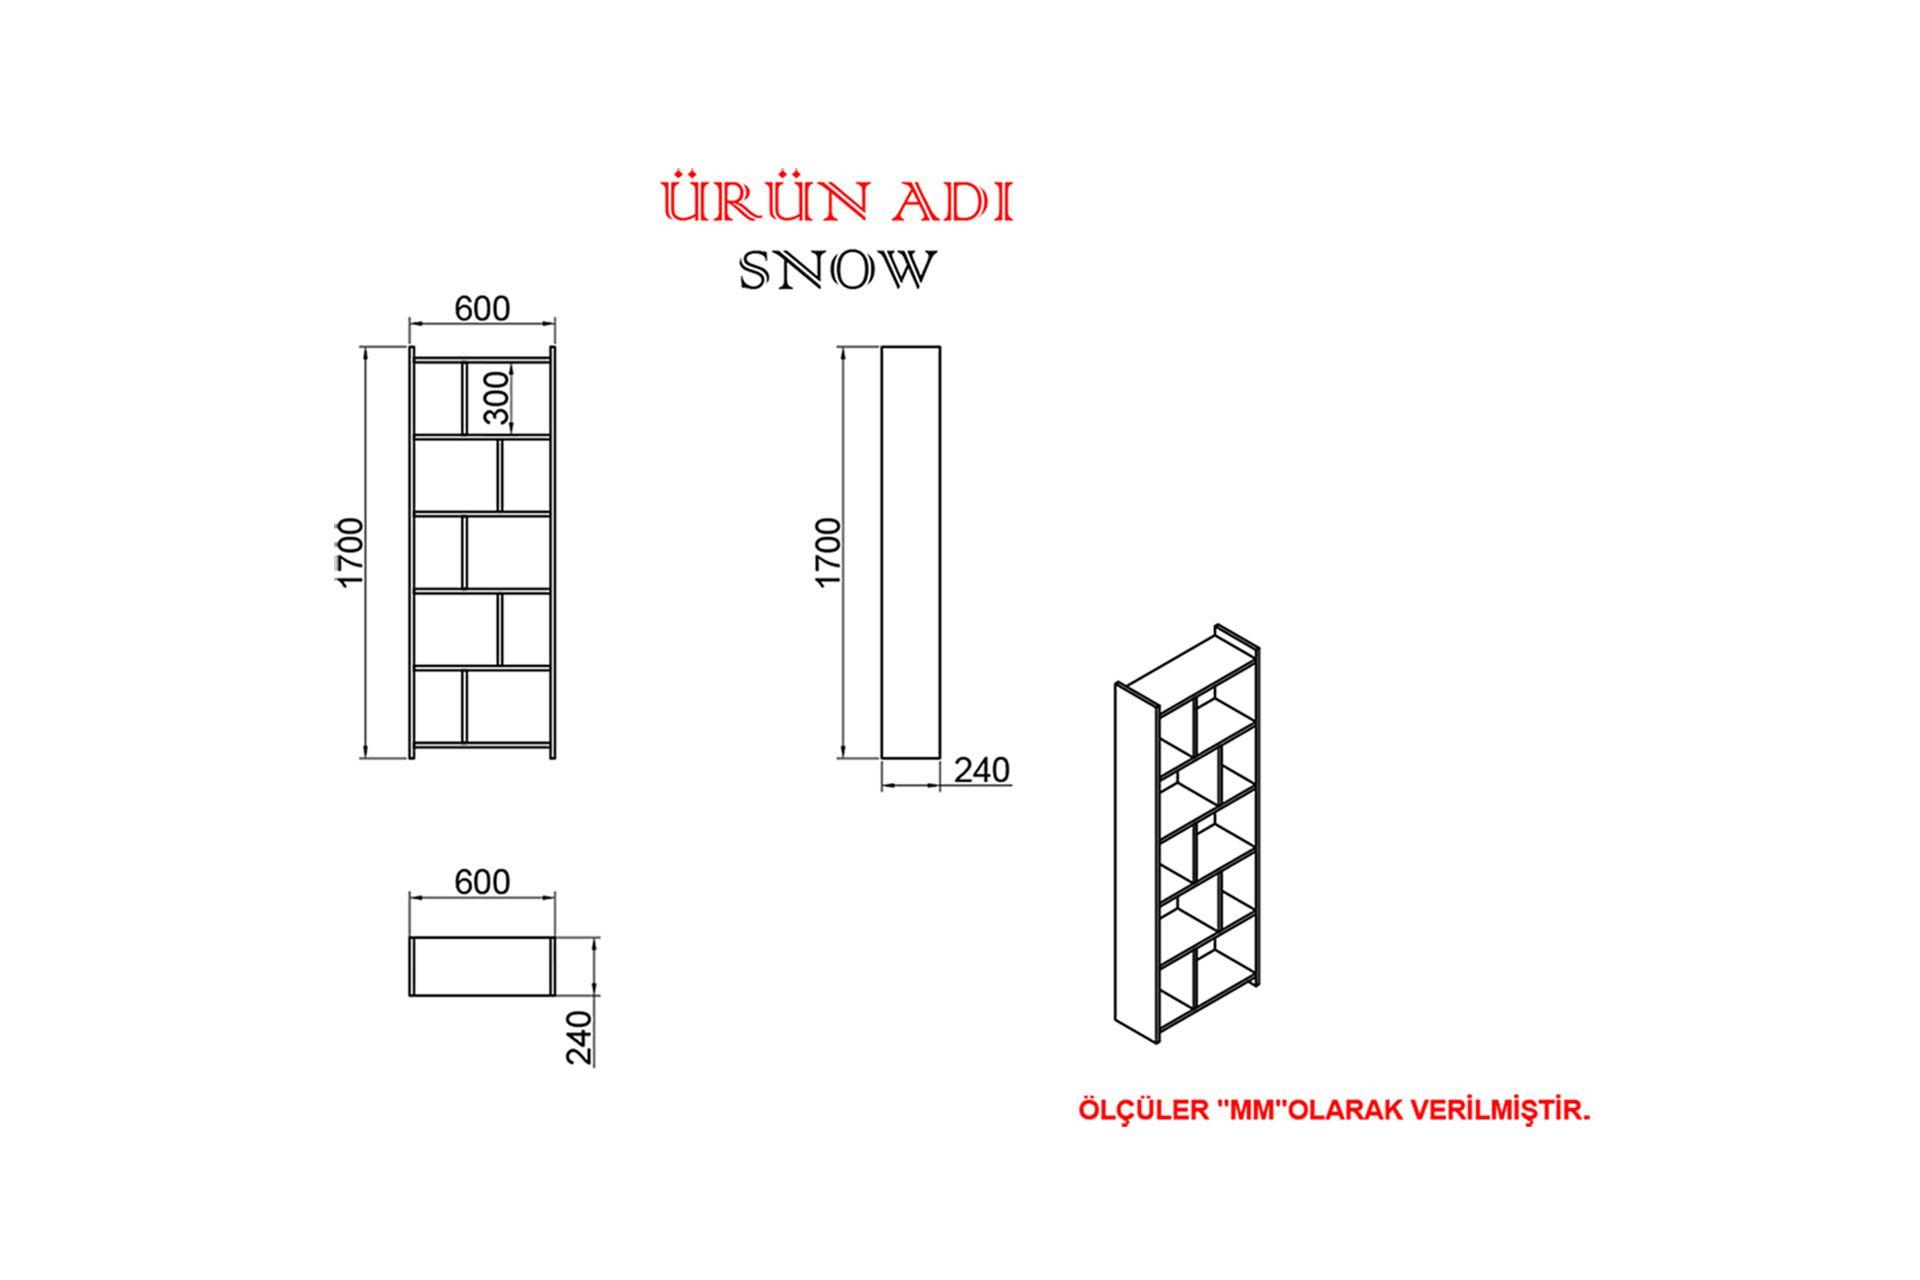 KALENDER DEKOR JİMMY-TWİNS SNOW 145 CM ÇALIŞMA MASASI TAKIMI JMS05